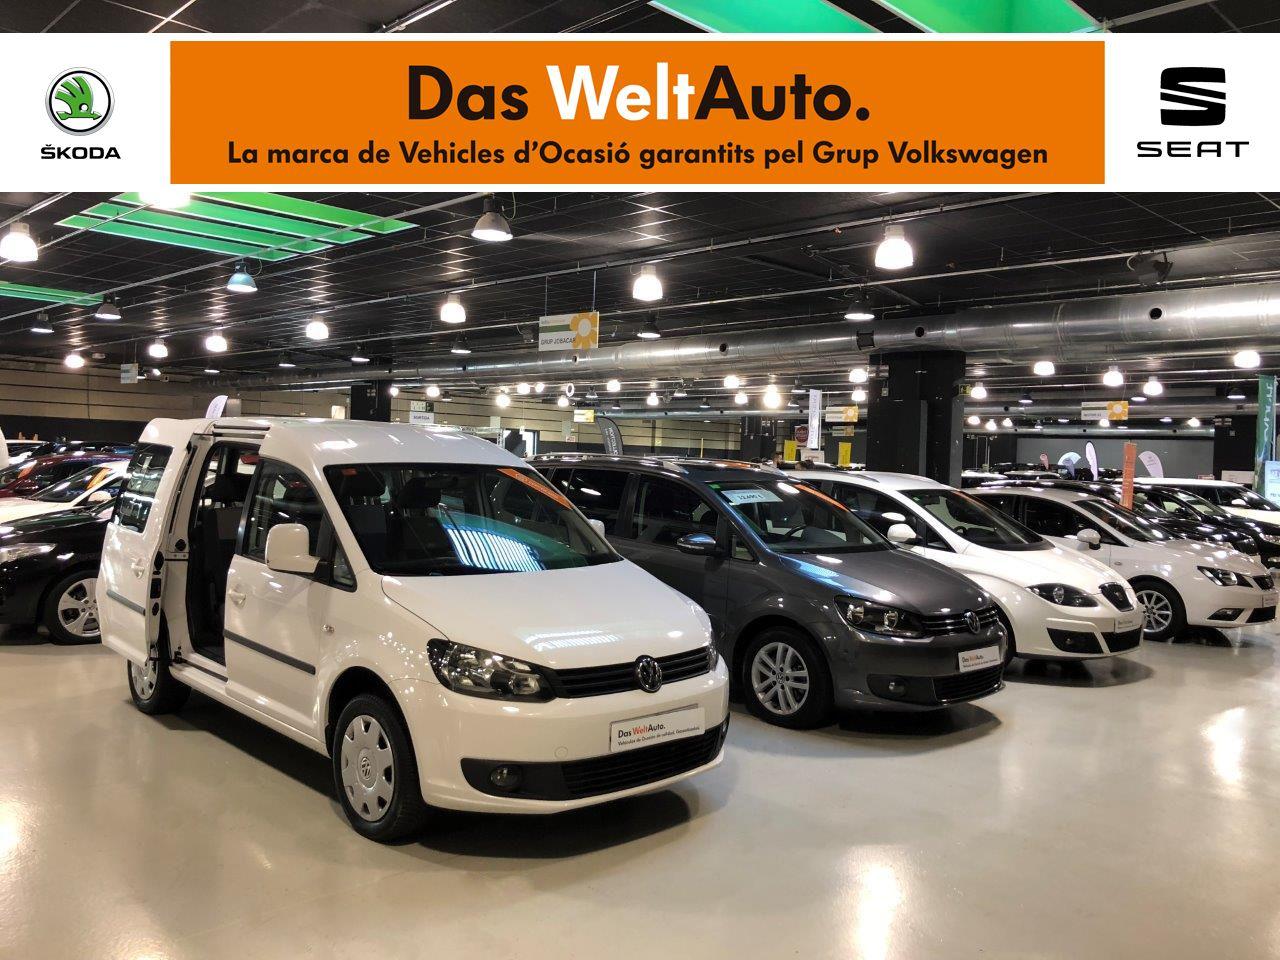 Fira Autoprimavera 2018